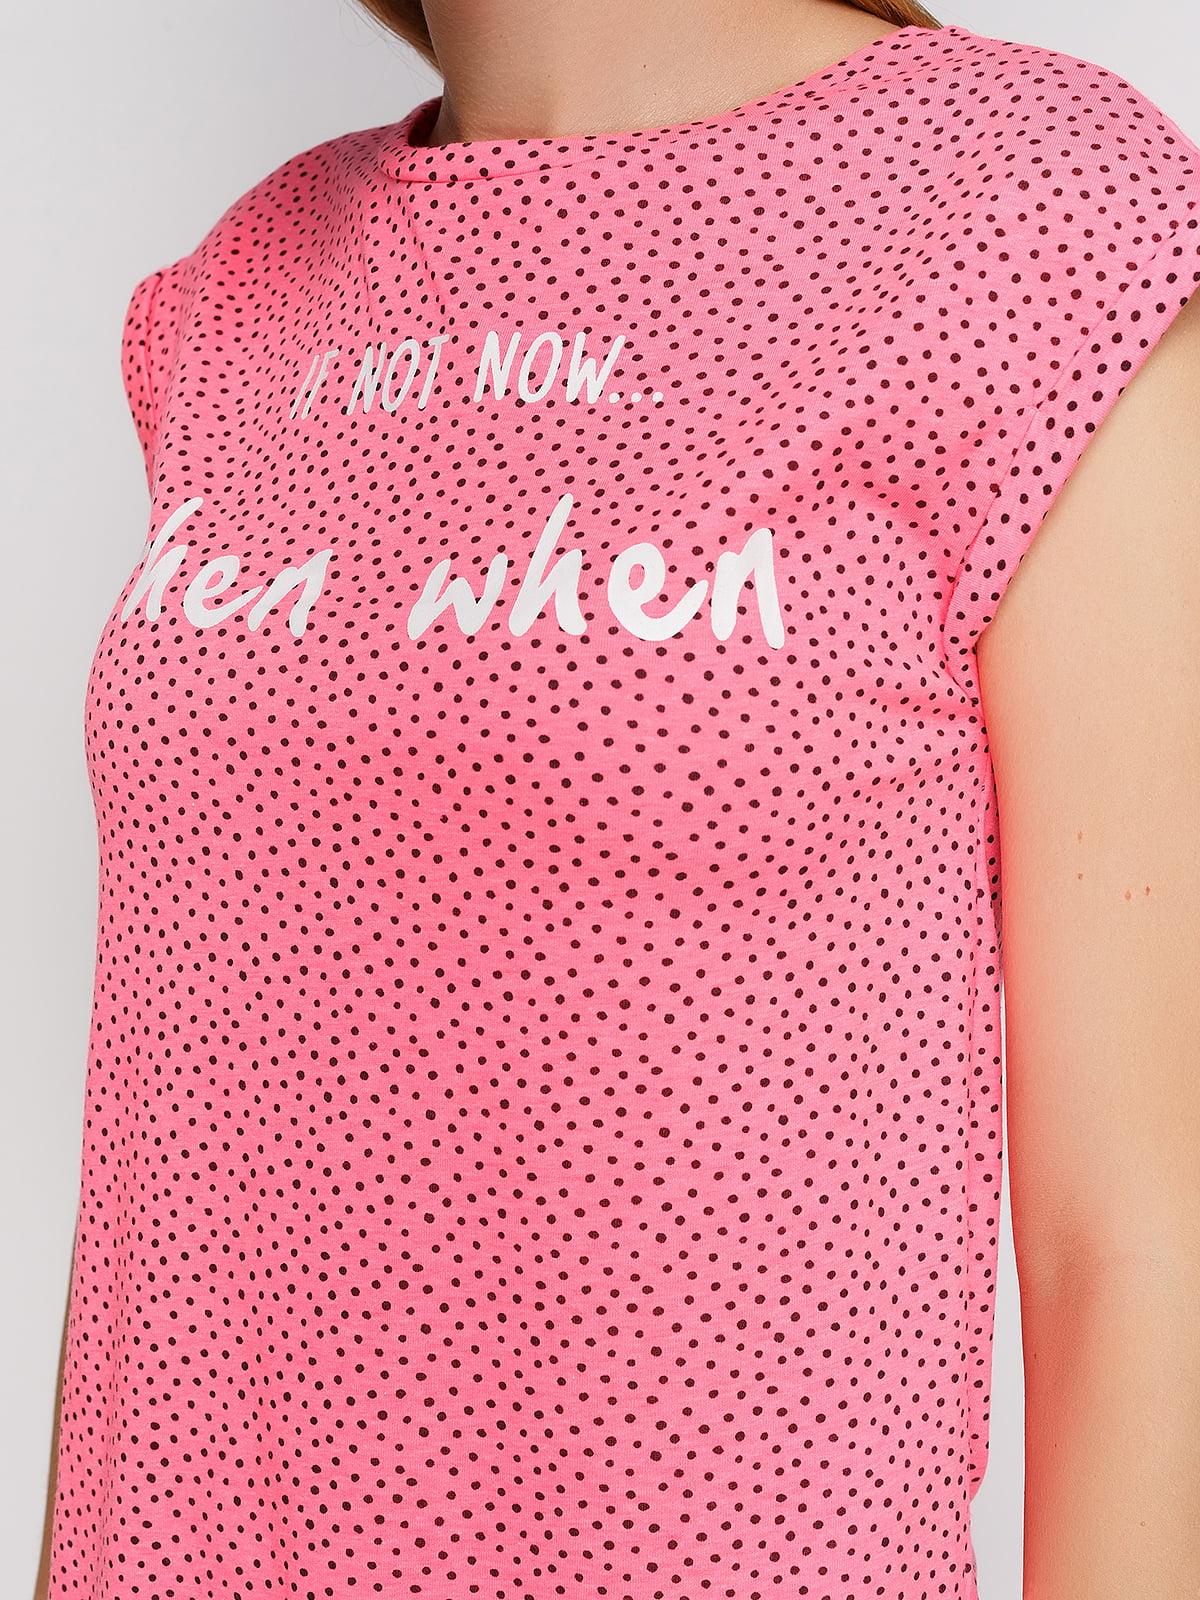 Футболка рожева з принтом | 3966766 | фото 4